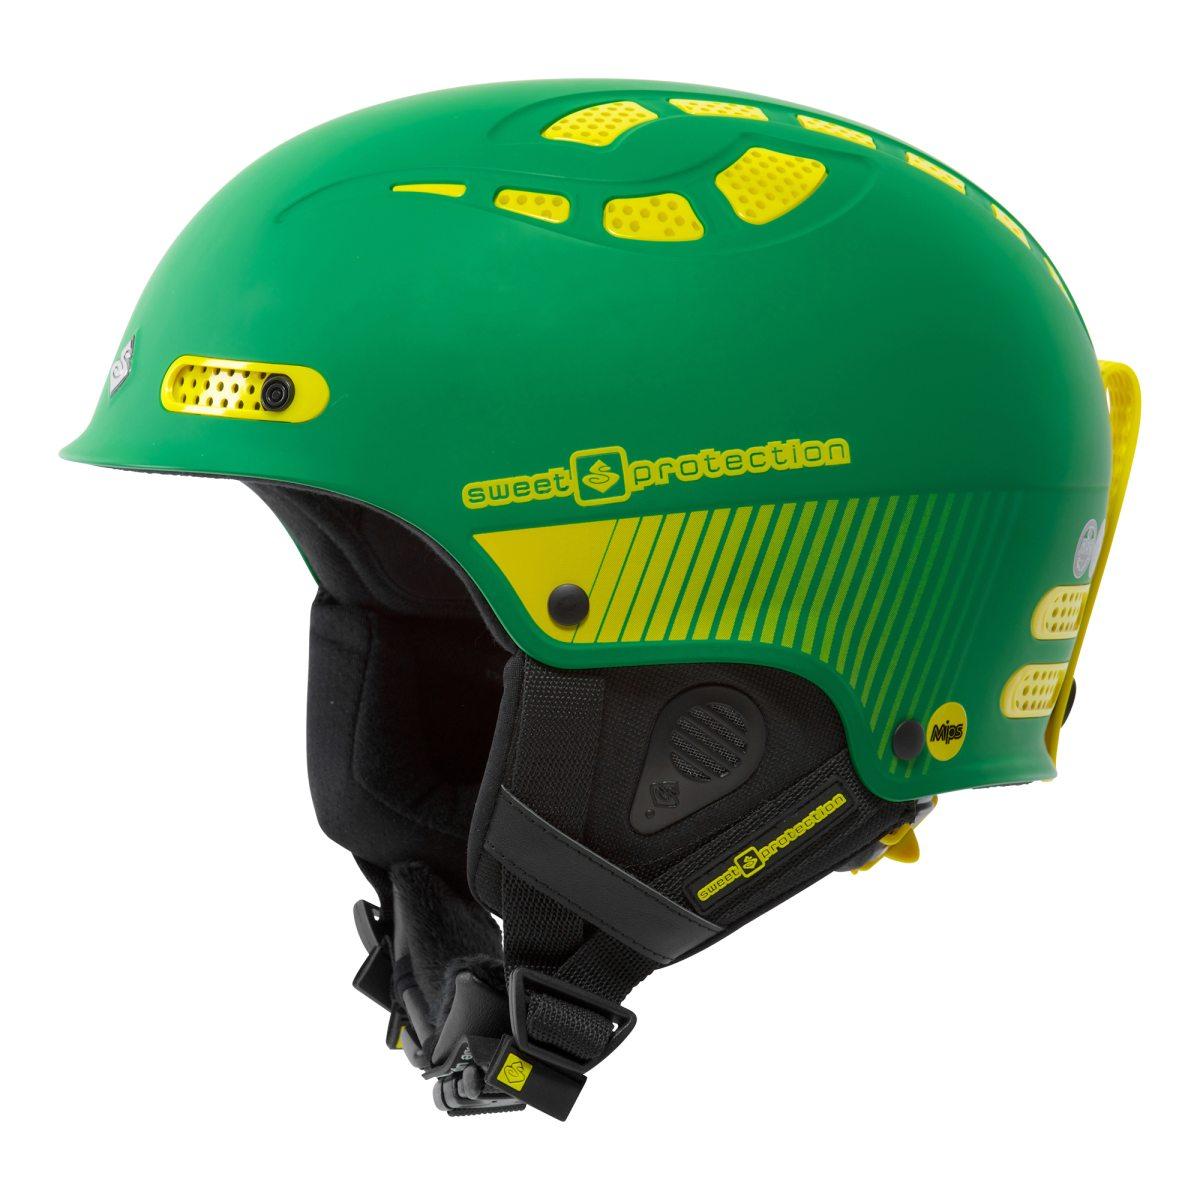 sweet protection alpin helmet igniter mips 15 16 alpinhjälm med skidhjälm 92721bd3c0bbb